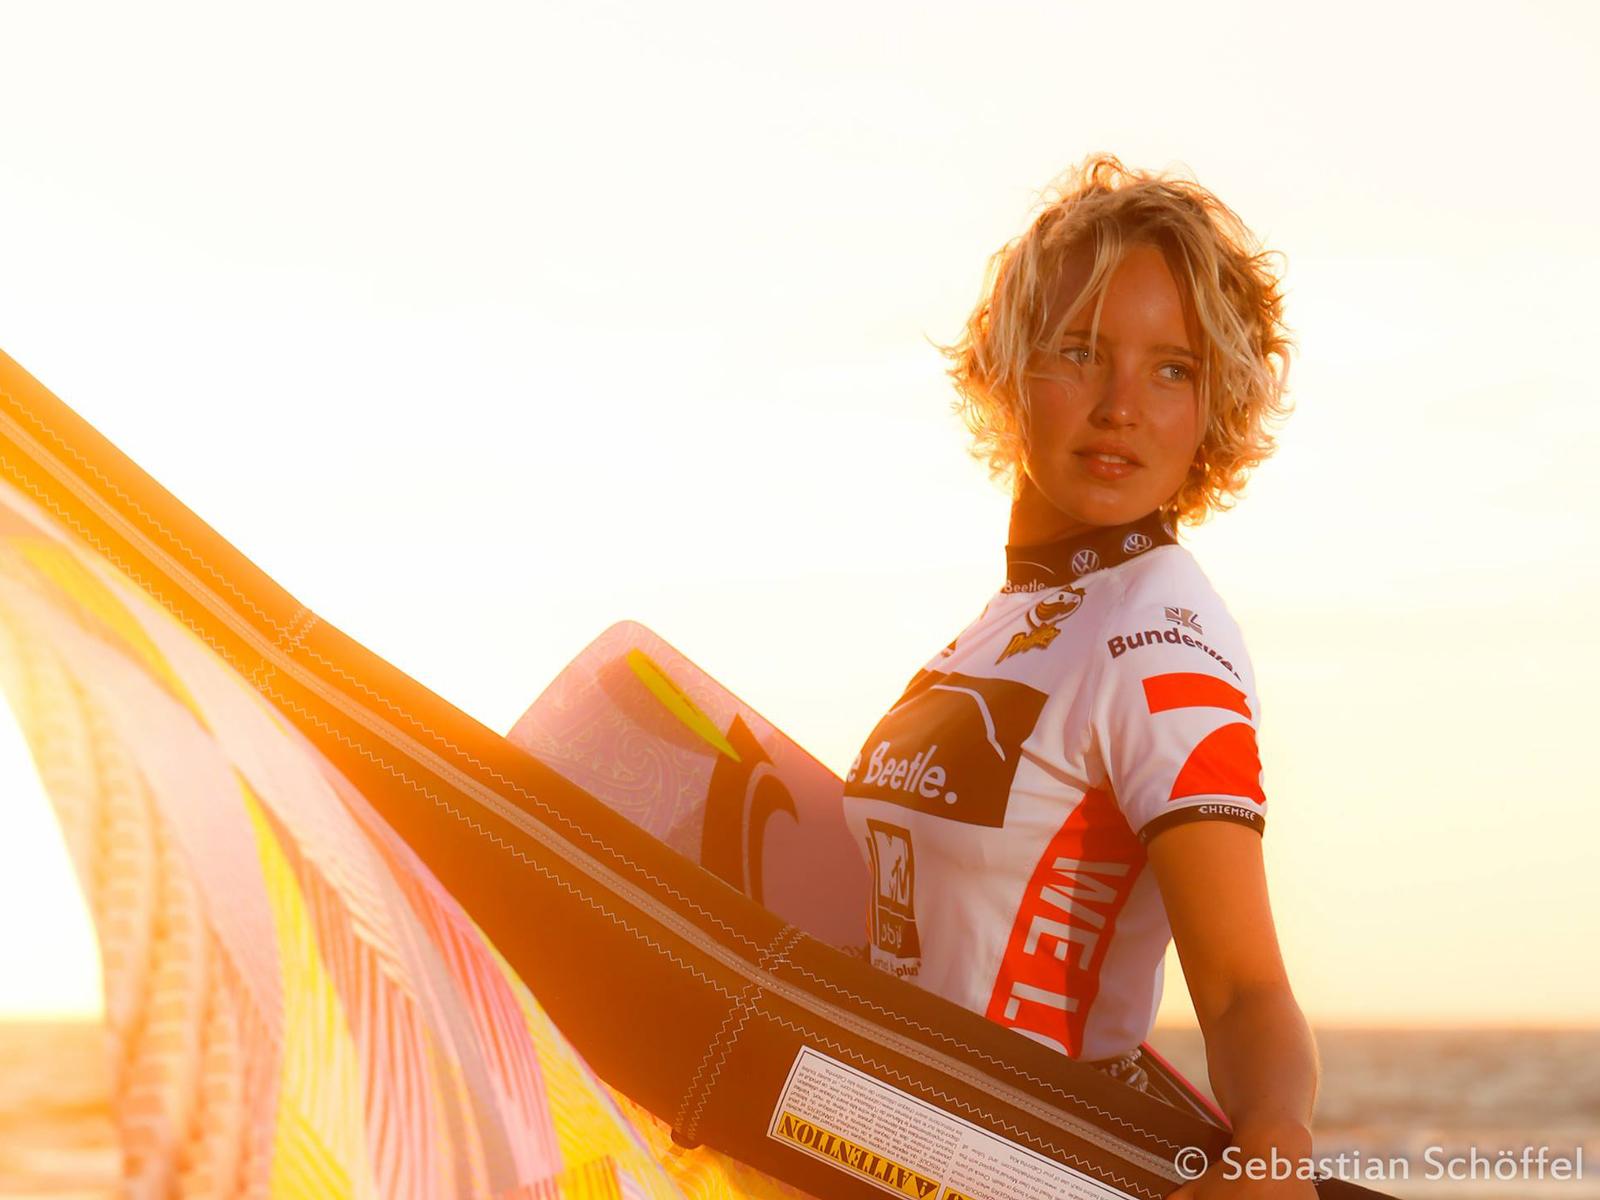 kitesurf wallpaper image - Annabel van Westerop sunset with kite - in resolution: Standard 4:3 1600 X 1200